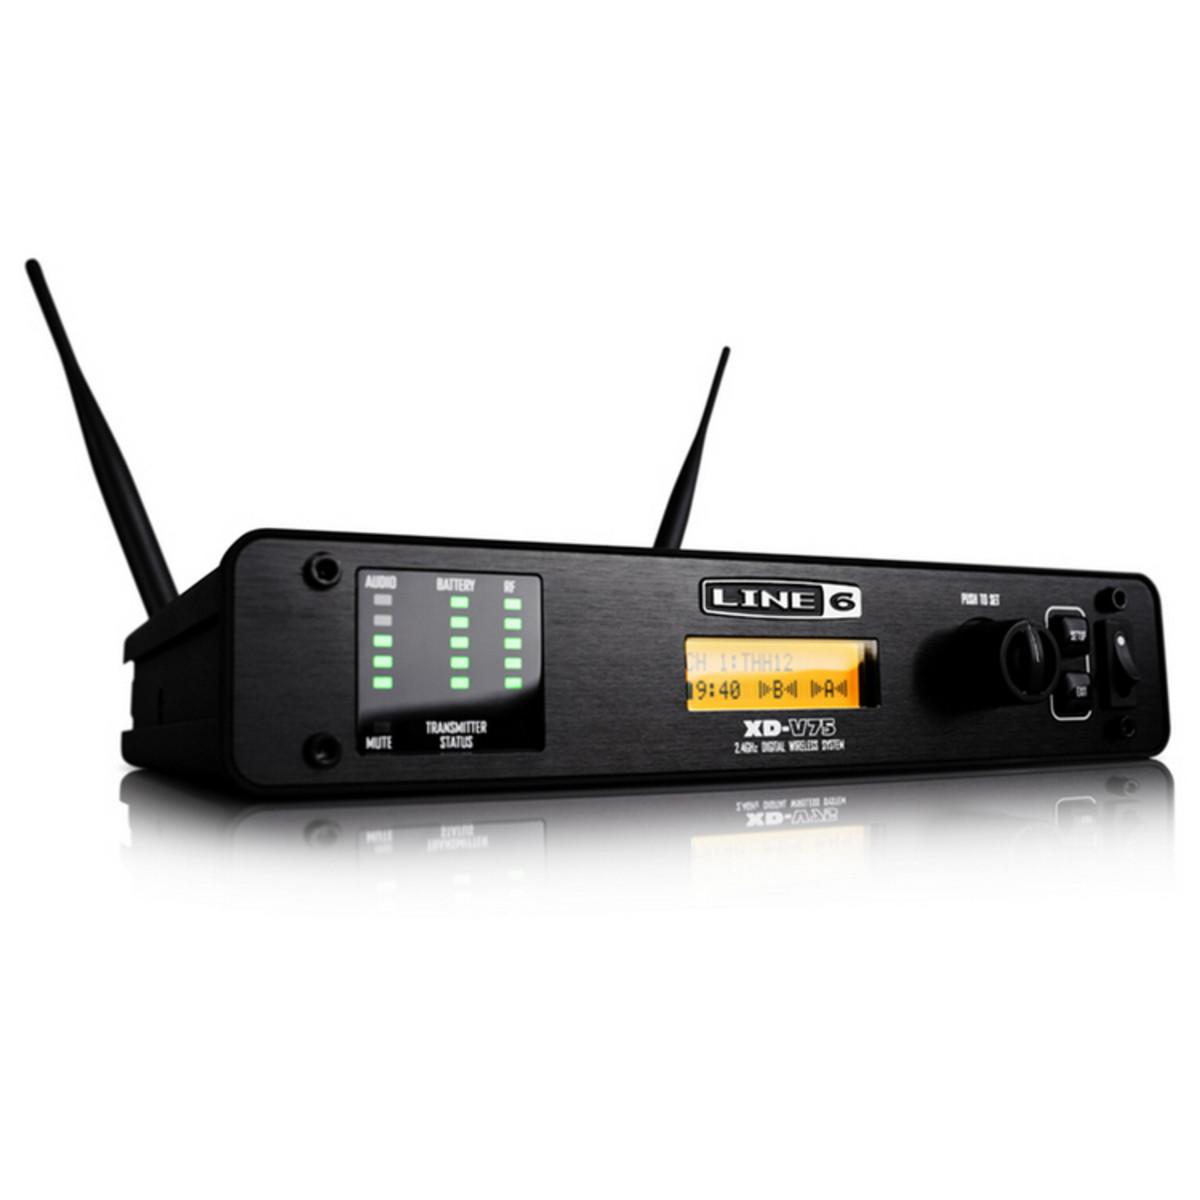 Line 6 Xd V75 Digital Wireless Handheld Mic System At